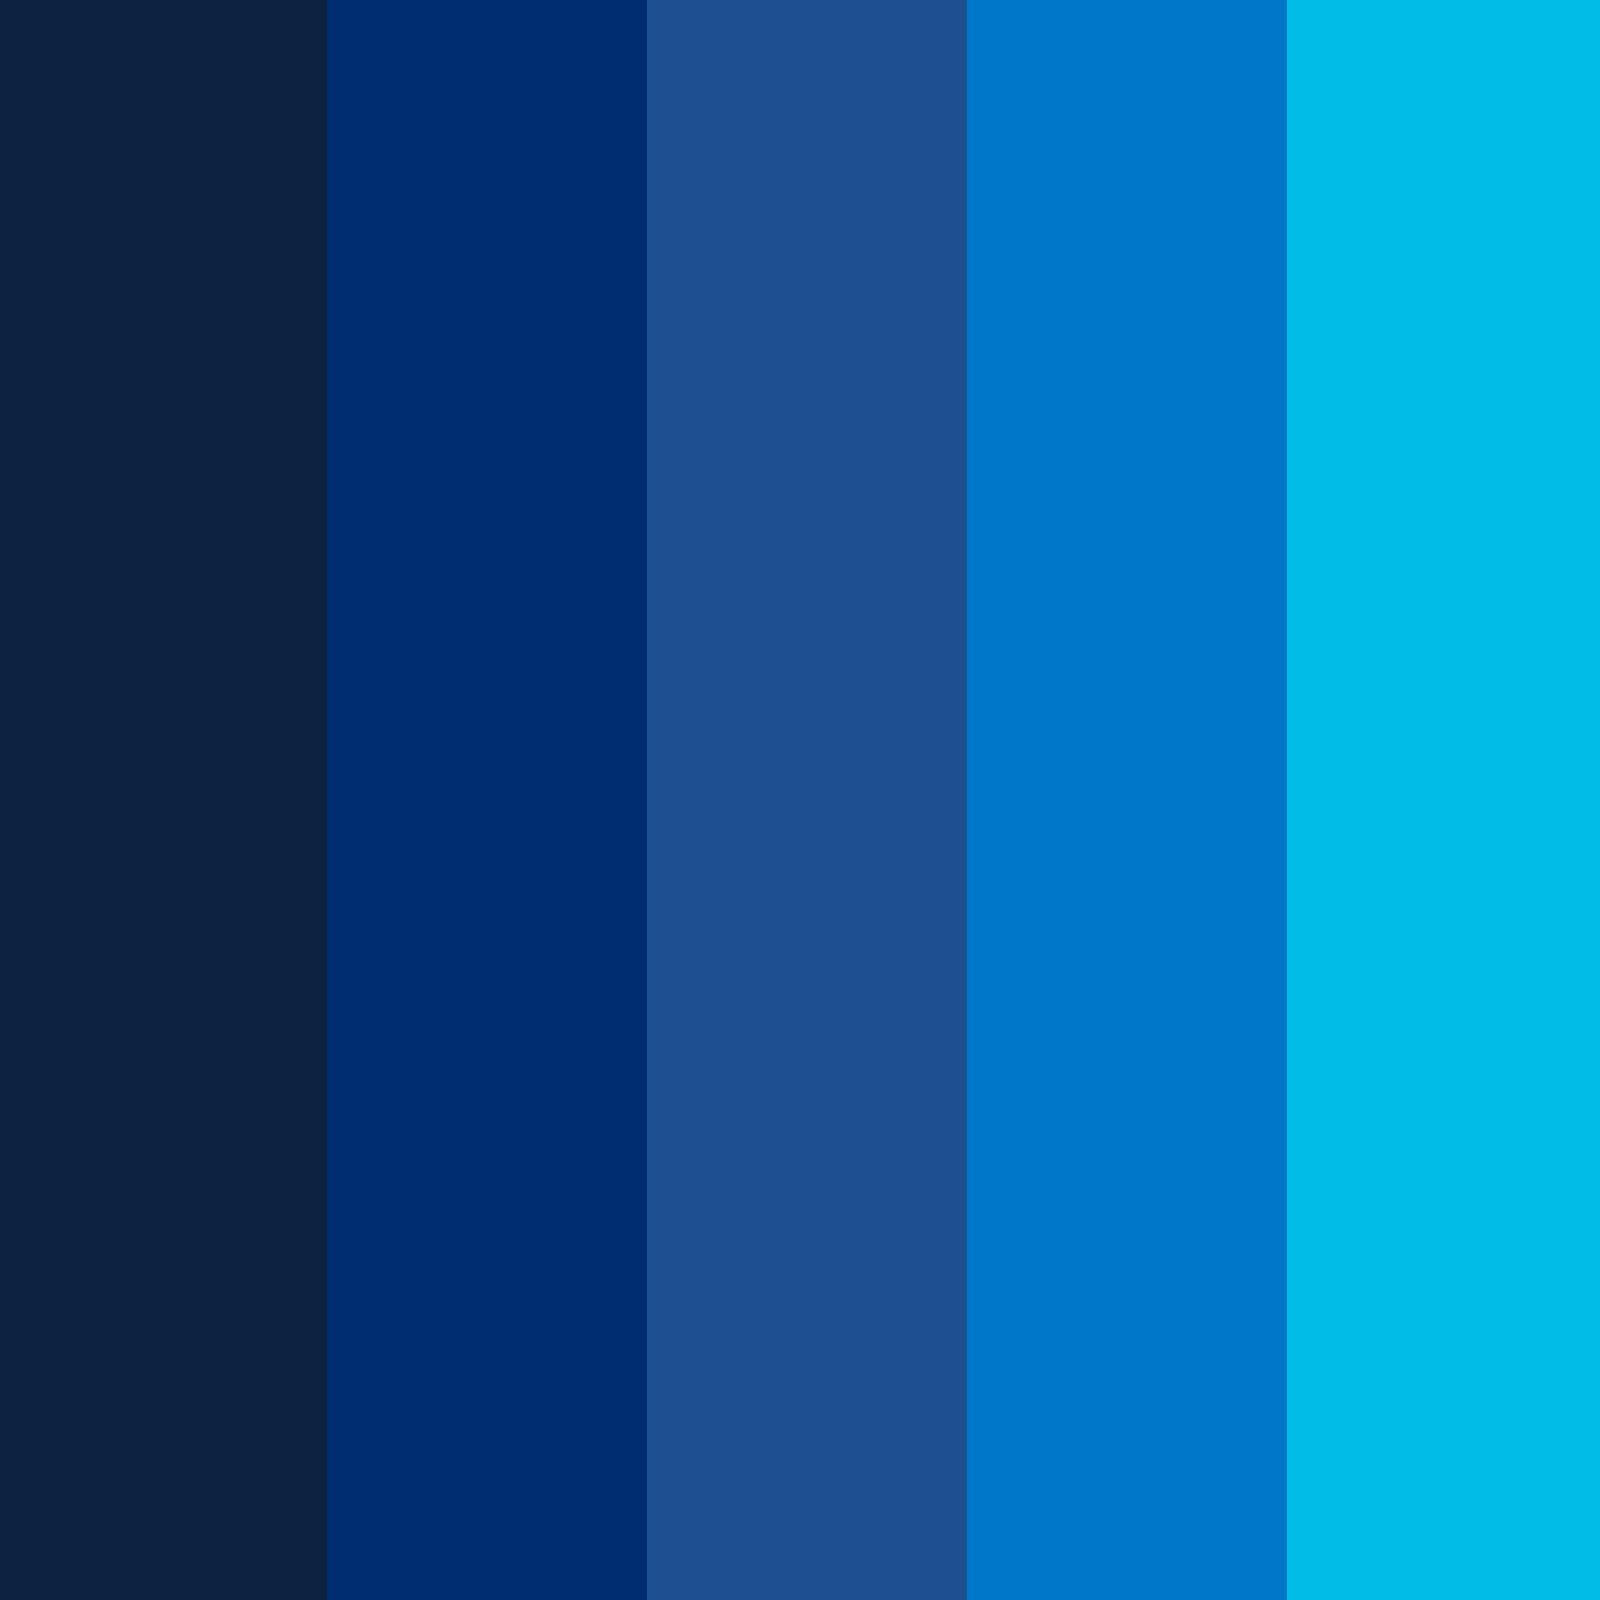 jkdc_dccc-colorpalette.png